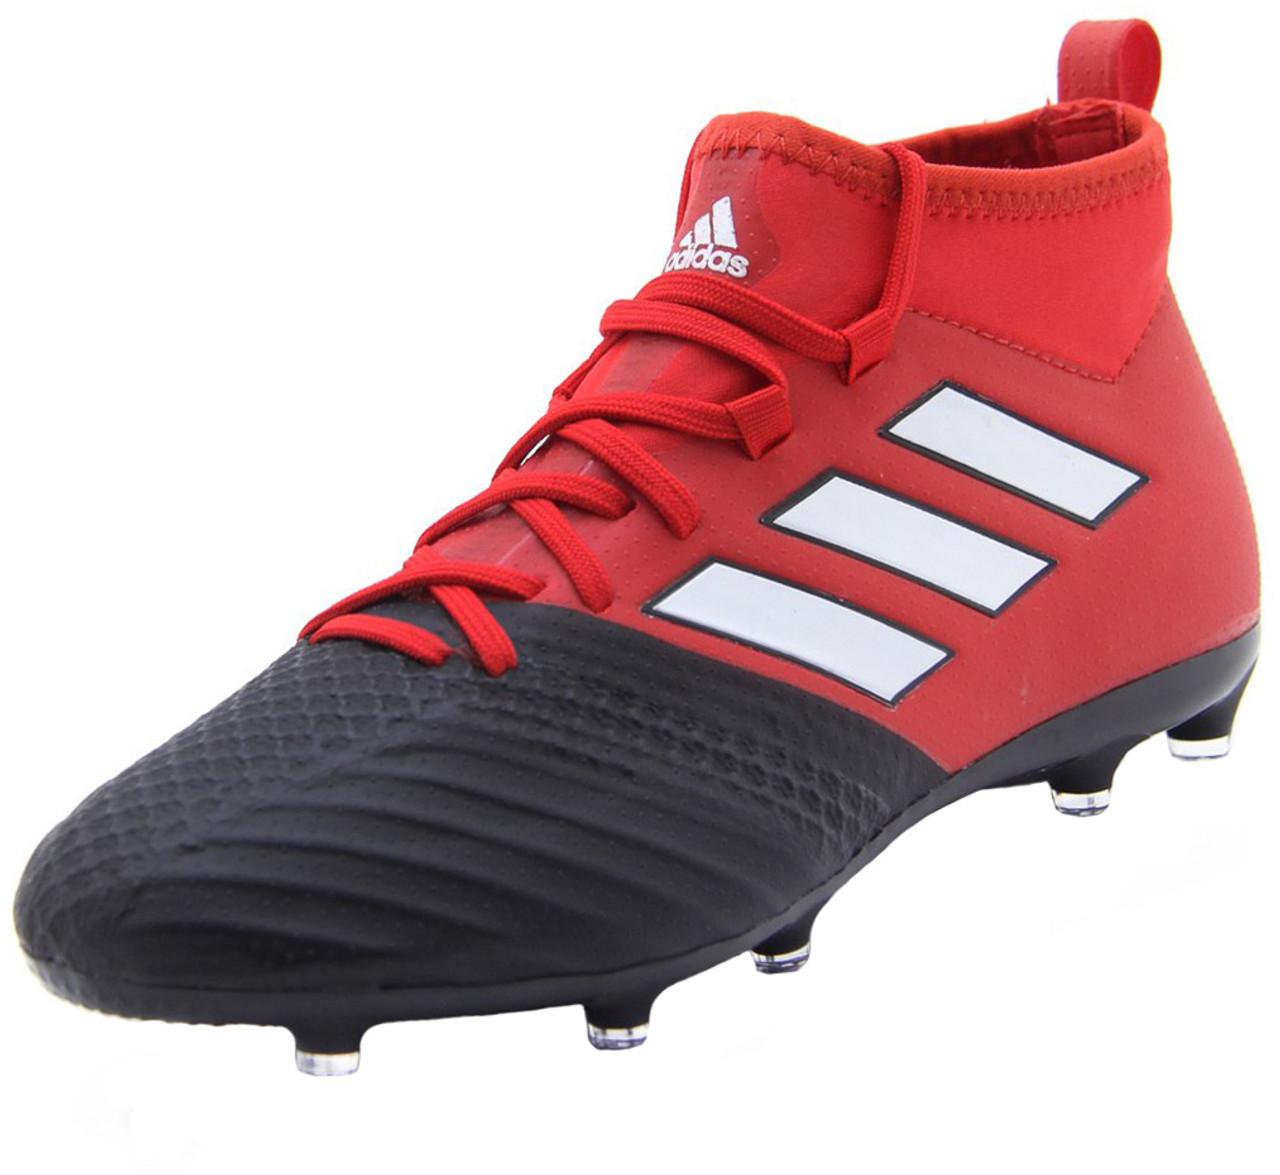 Adidas Ace 17.1 Purecontrol FG Jr BlackRed (071519) (RC)